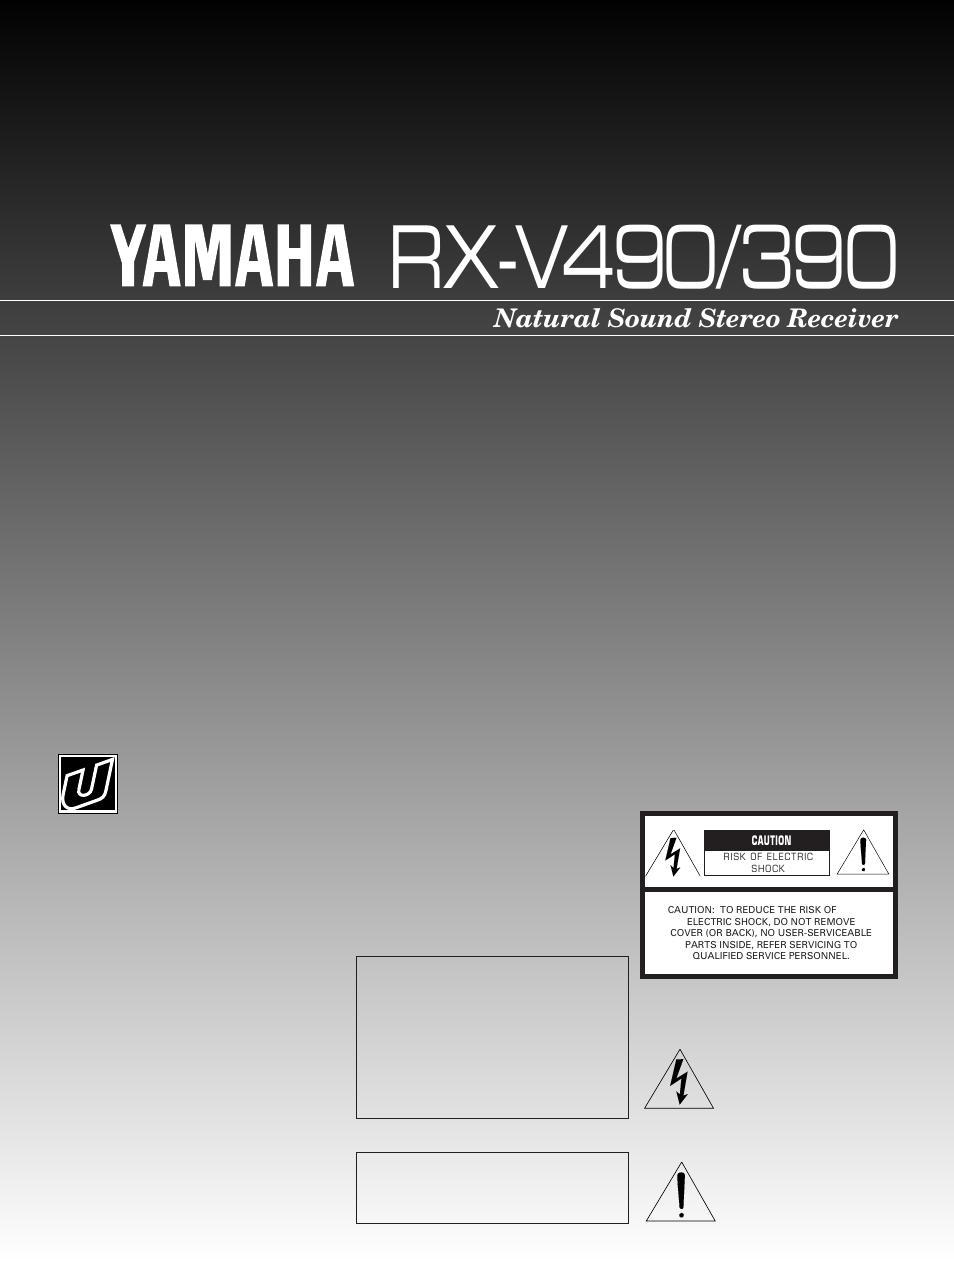 Yamaha RX-V4/390 User Manual | 31 pages